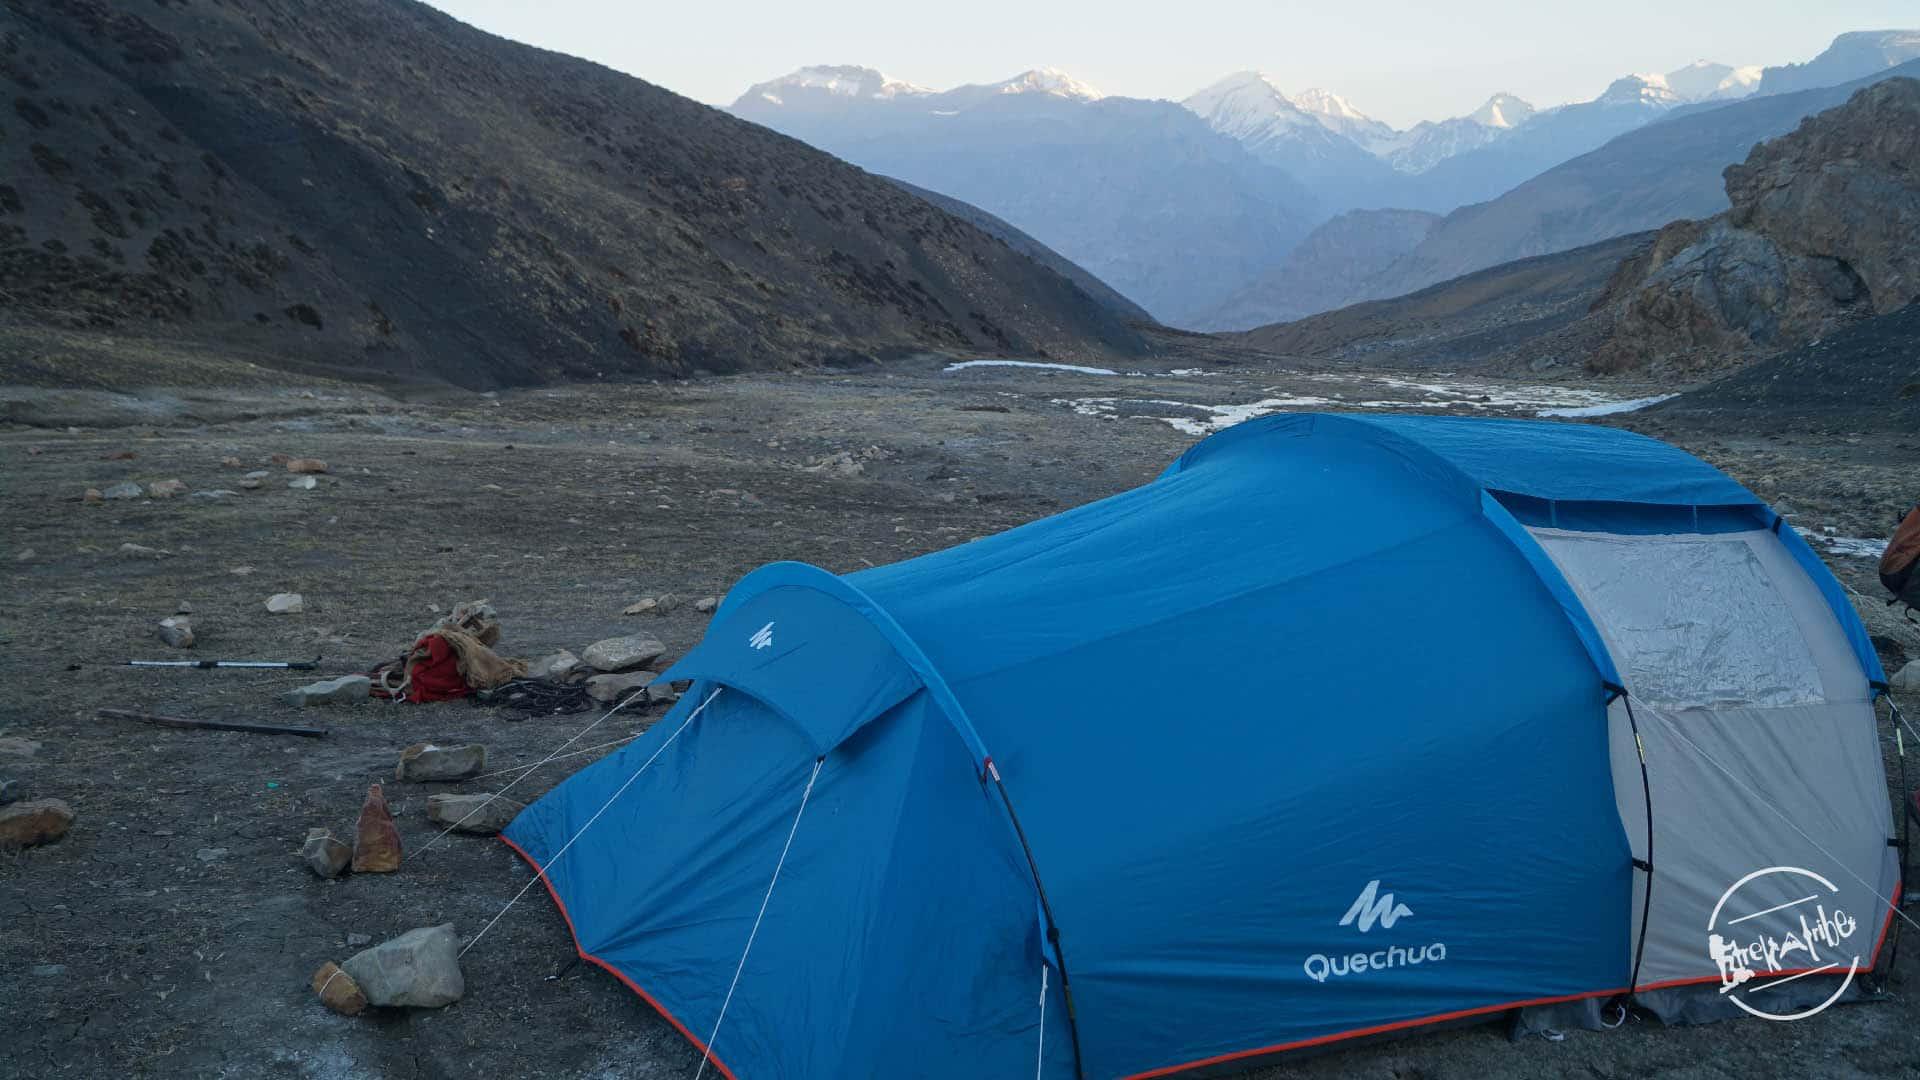 Kanamo peak expidition - camping